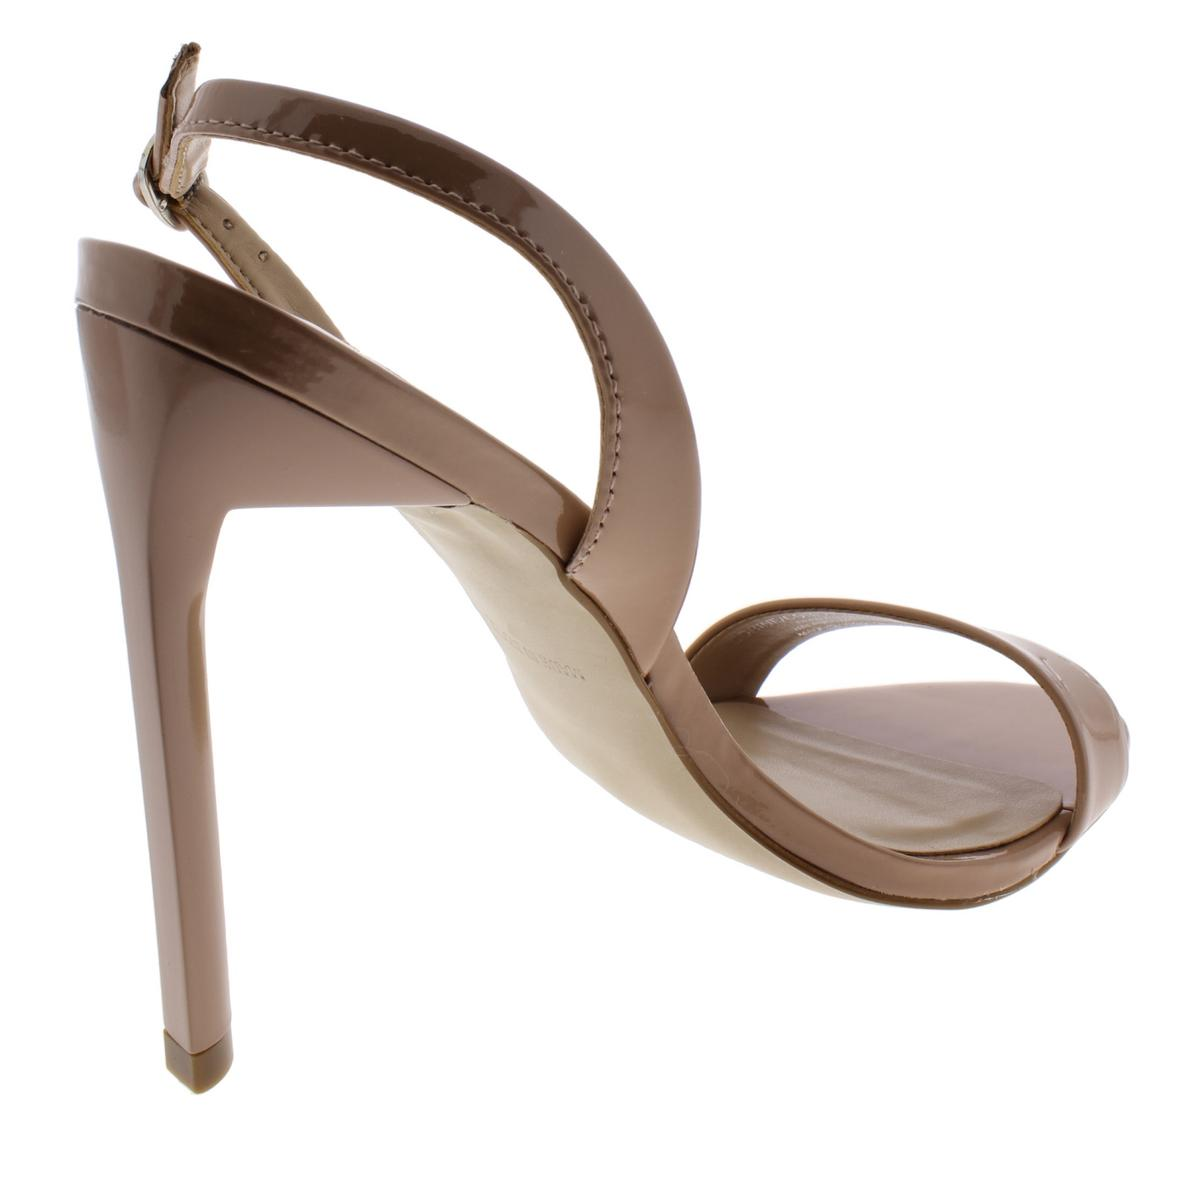 Steve-Madden-Womens-Corine-Patent-Leather-Stiletto-Dress-Sandals-Shoes-BHFO-2344 thumbnail 6